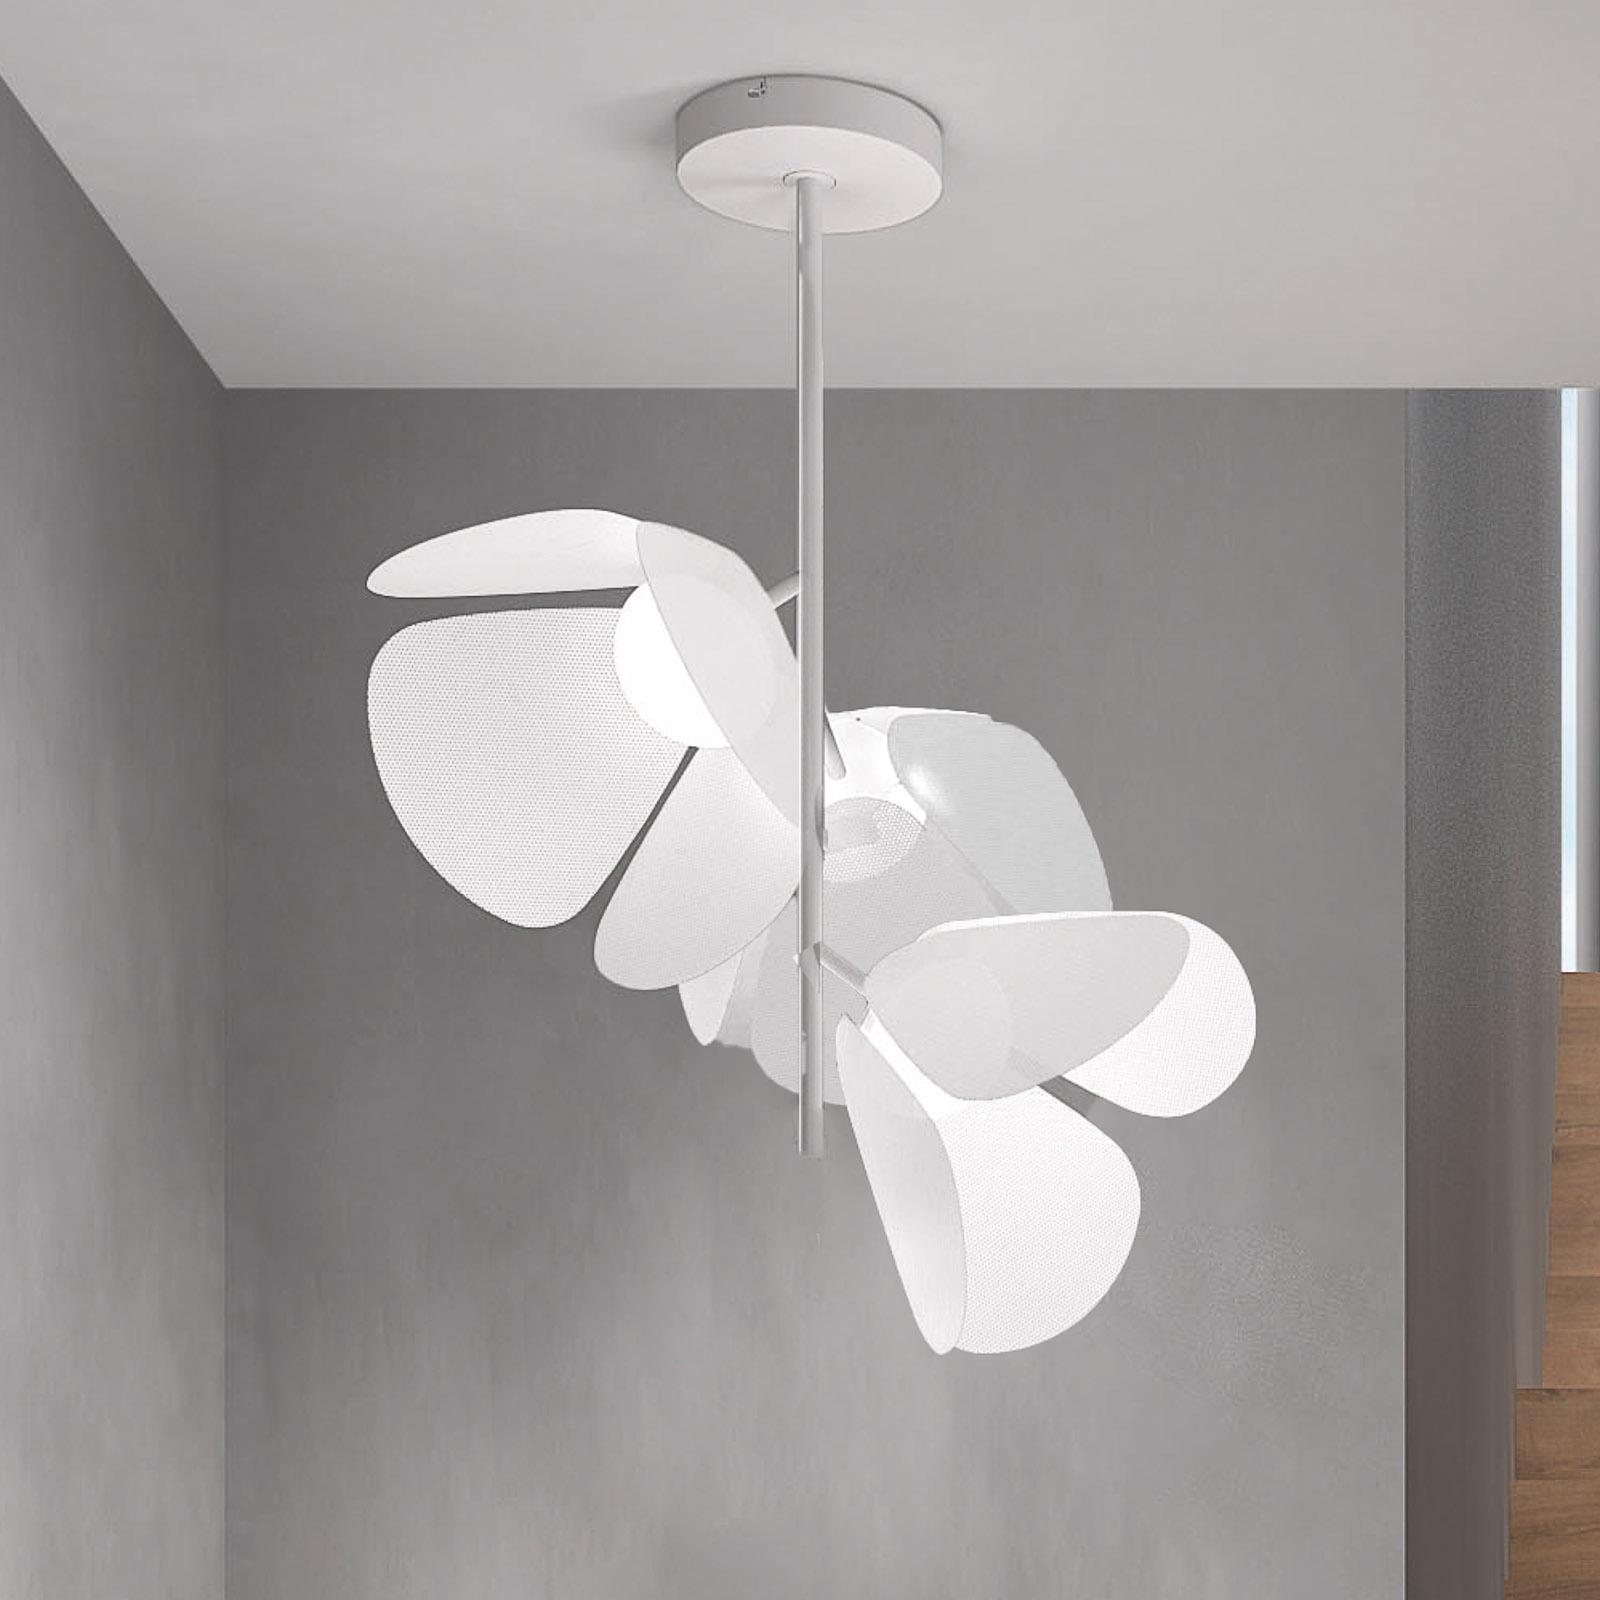 Bover Mod PF/73/3L LED-loftlampe, hvid